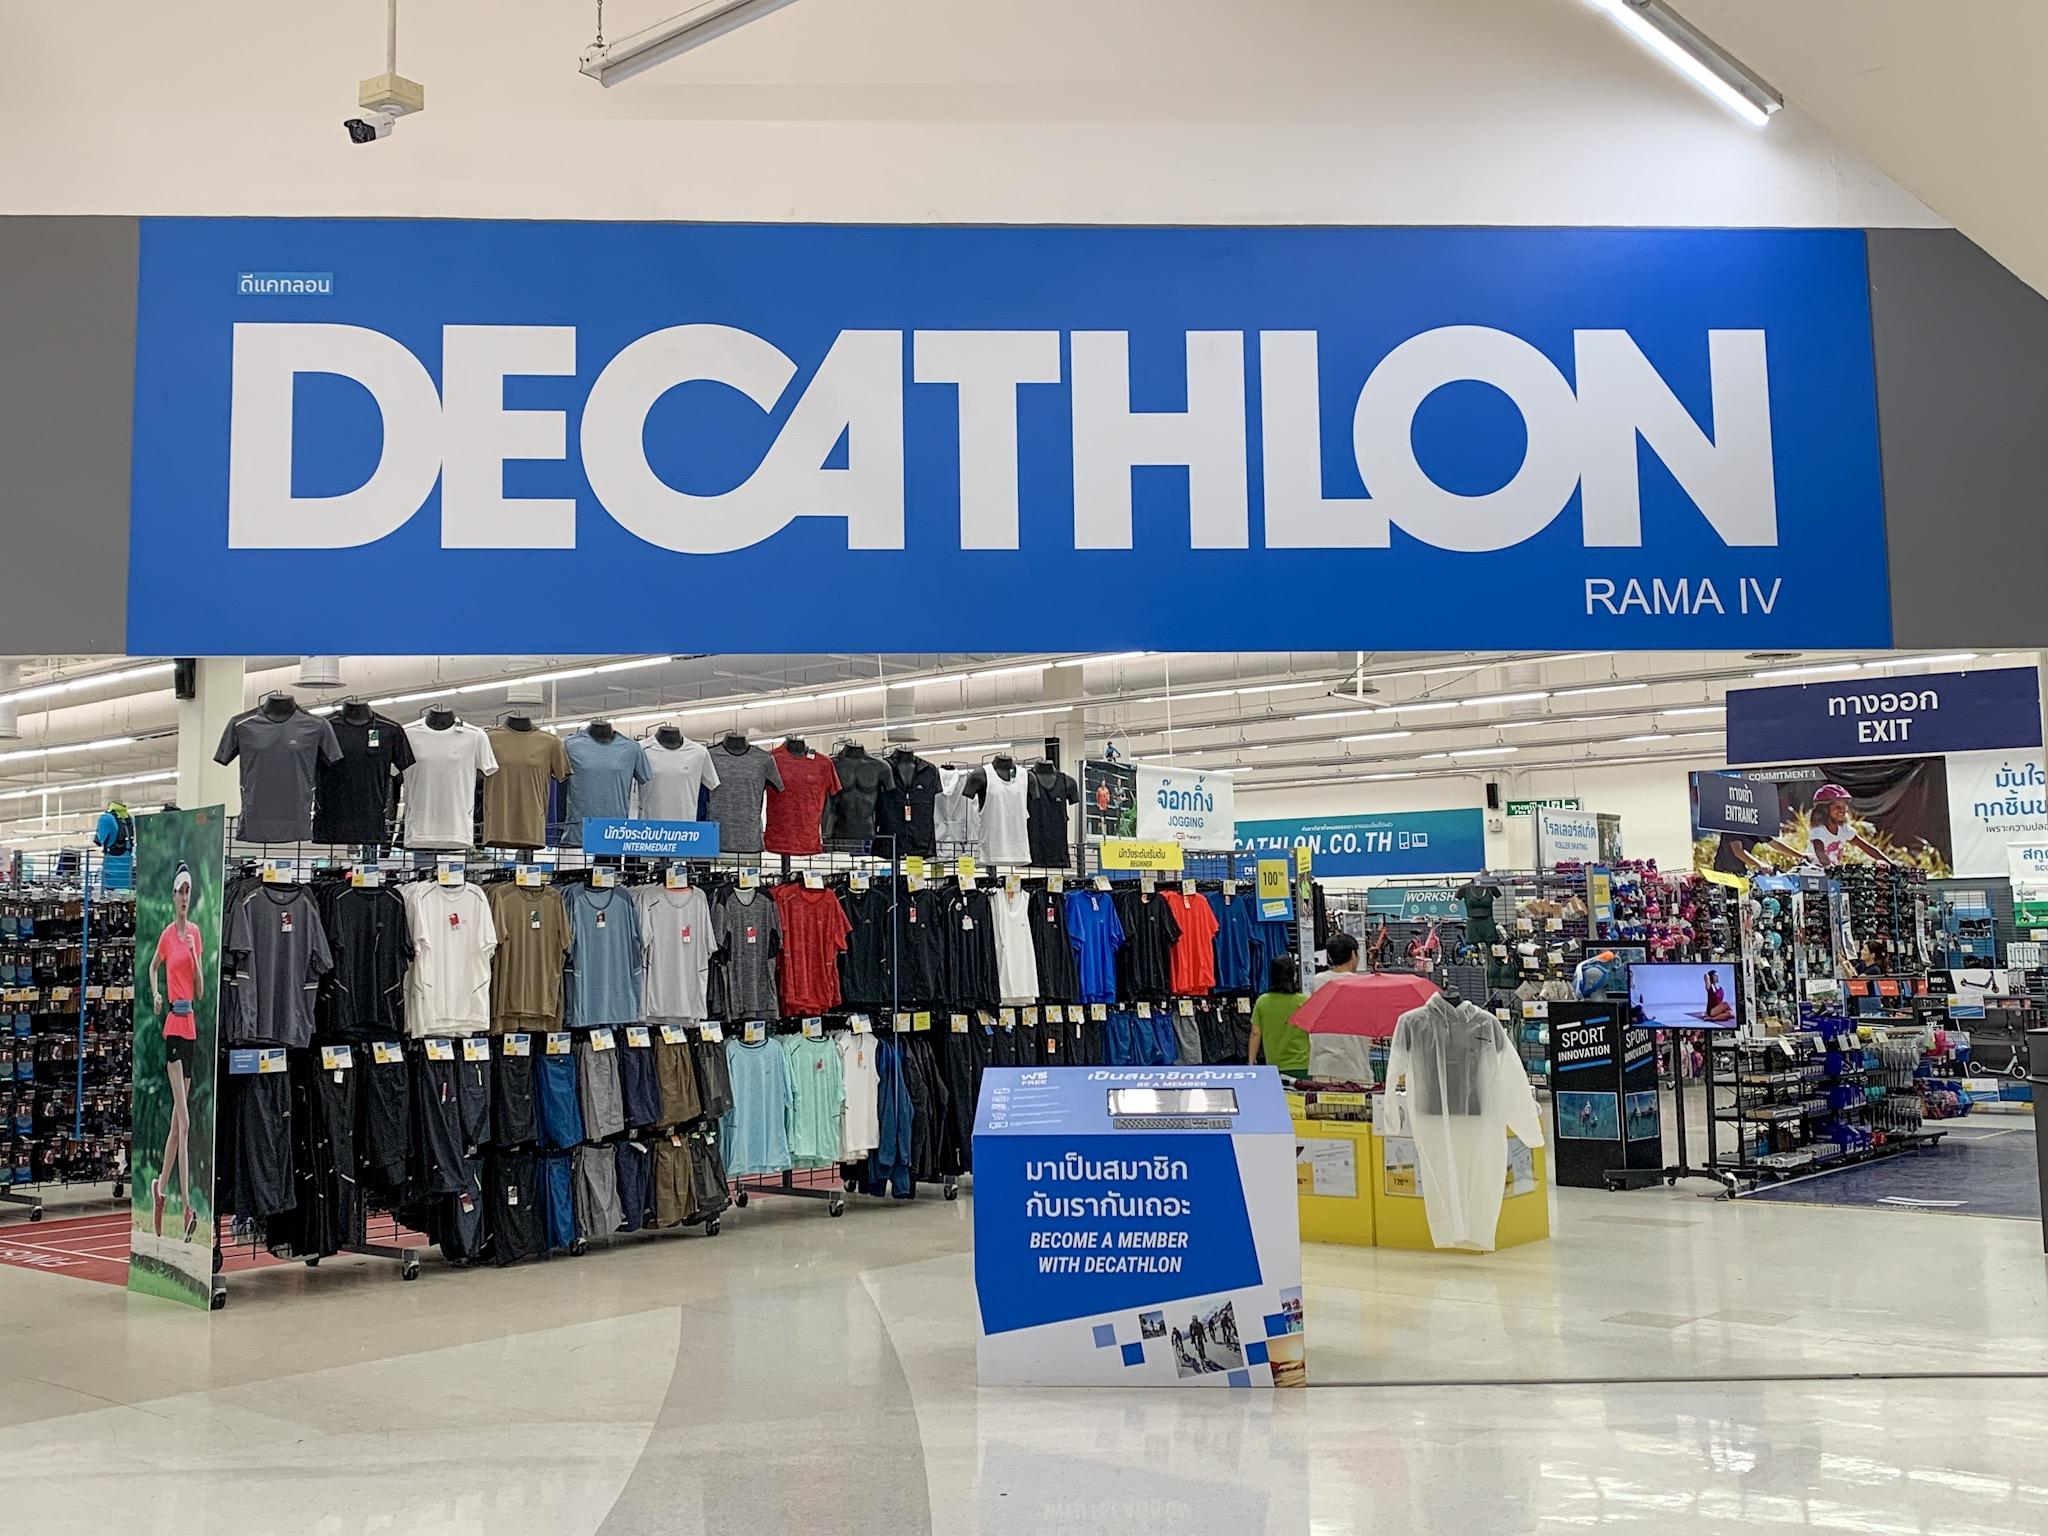 Thegolfretreat_bangkok_Decathlon8